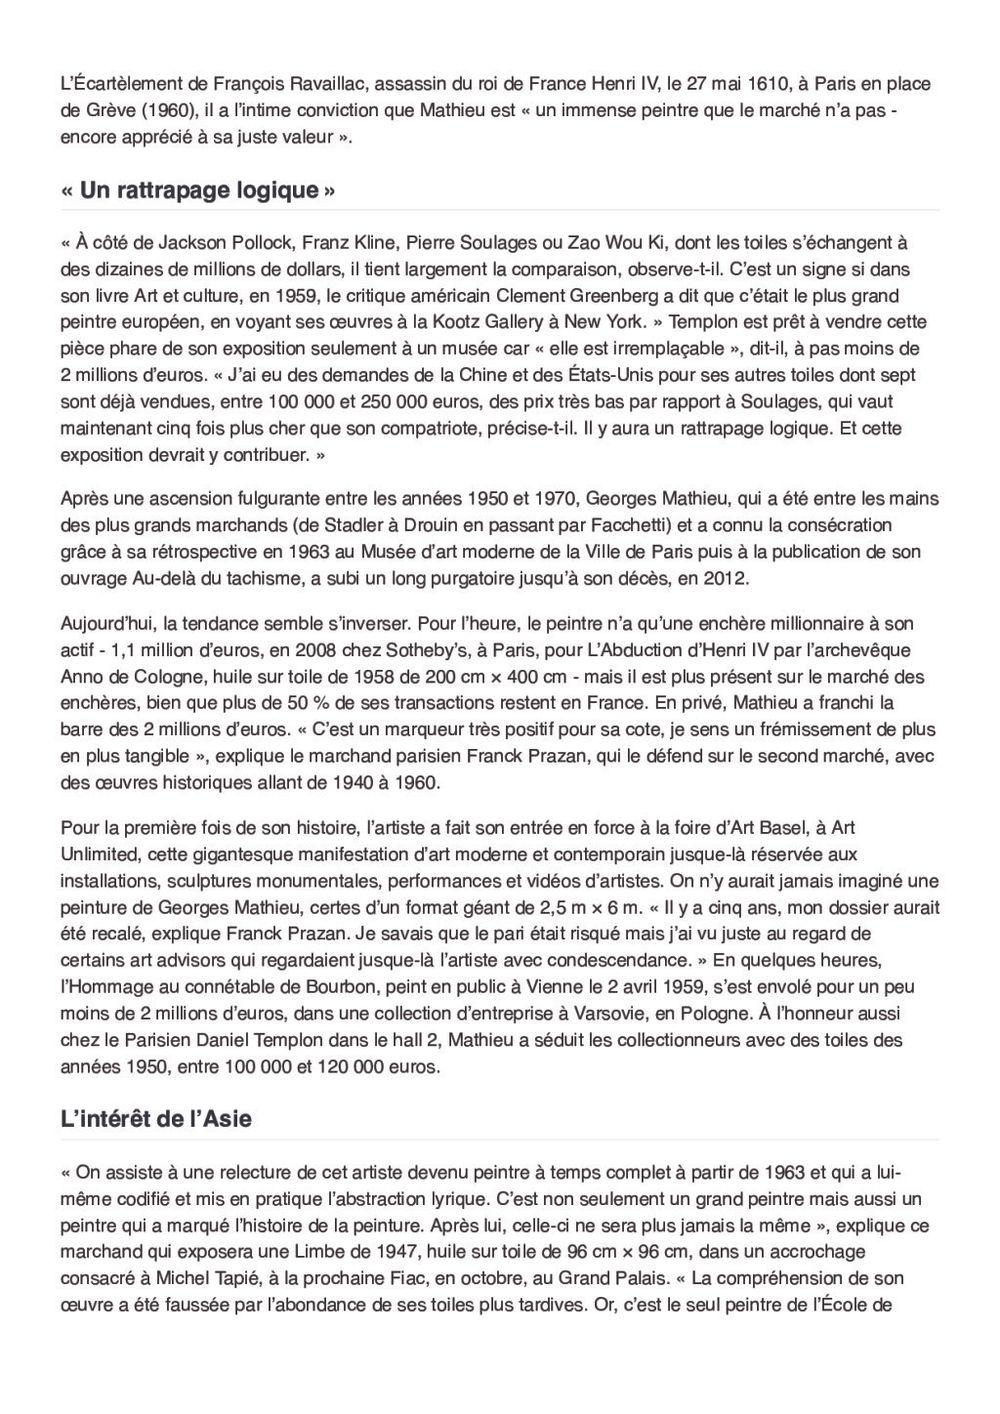 Le Figaro | Georges MATHIEU